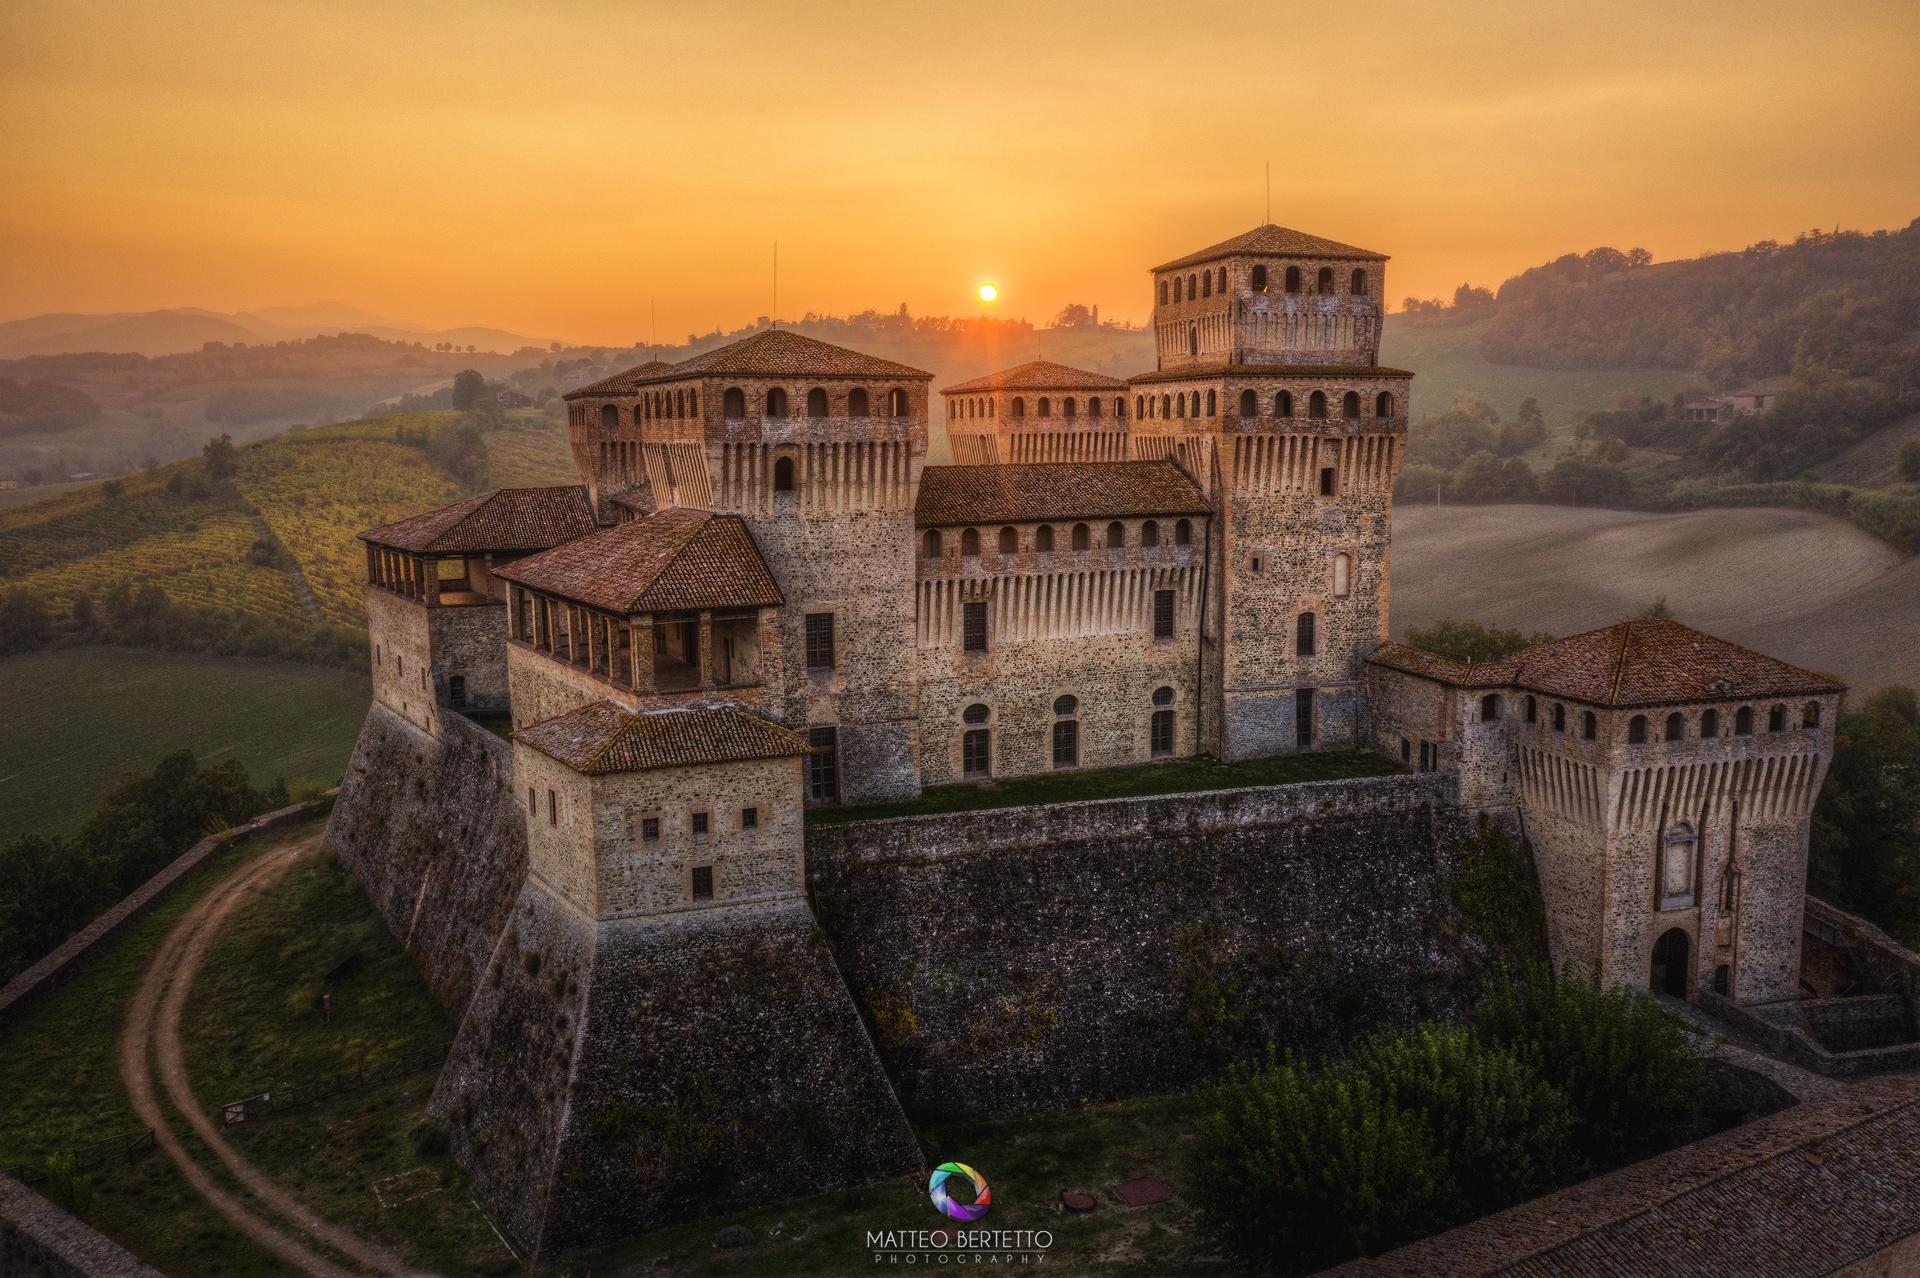 Castle of Torrechiara-Langhirano (Parma)...